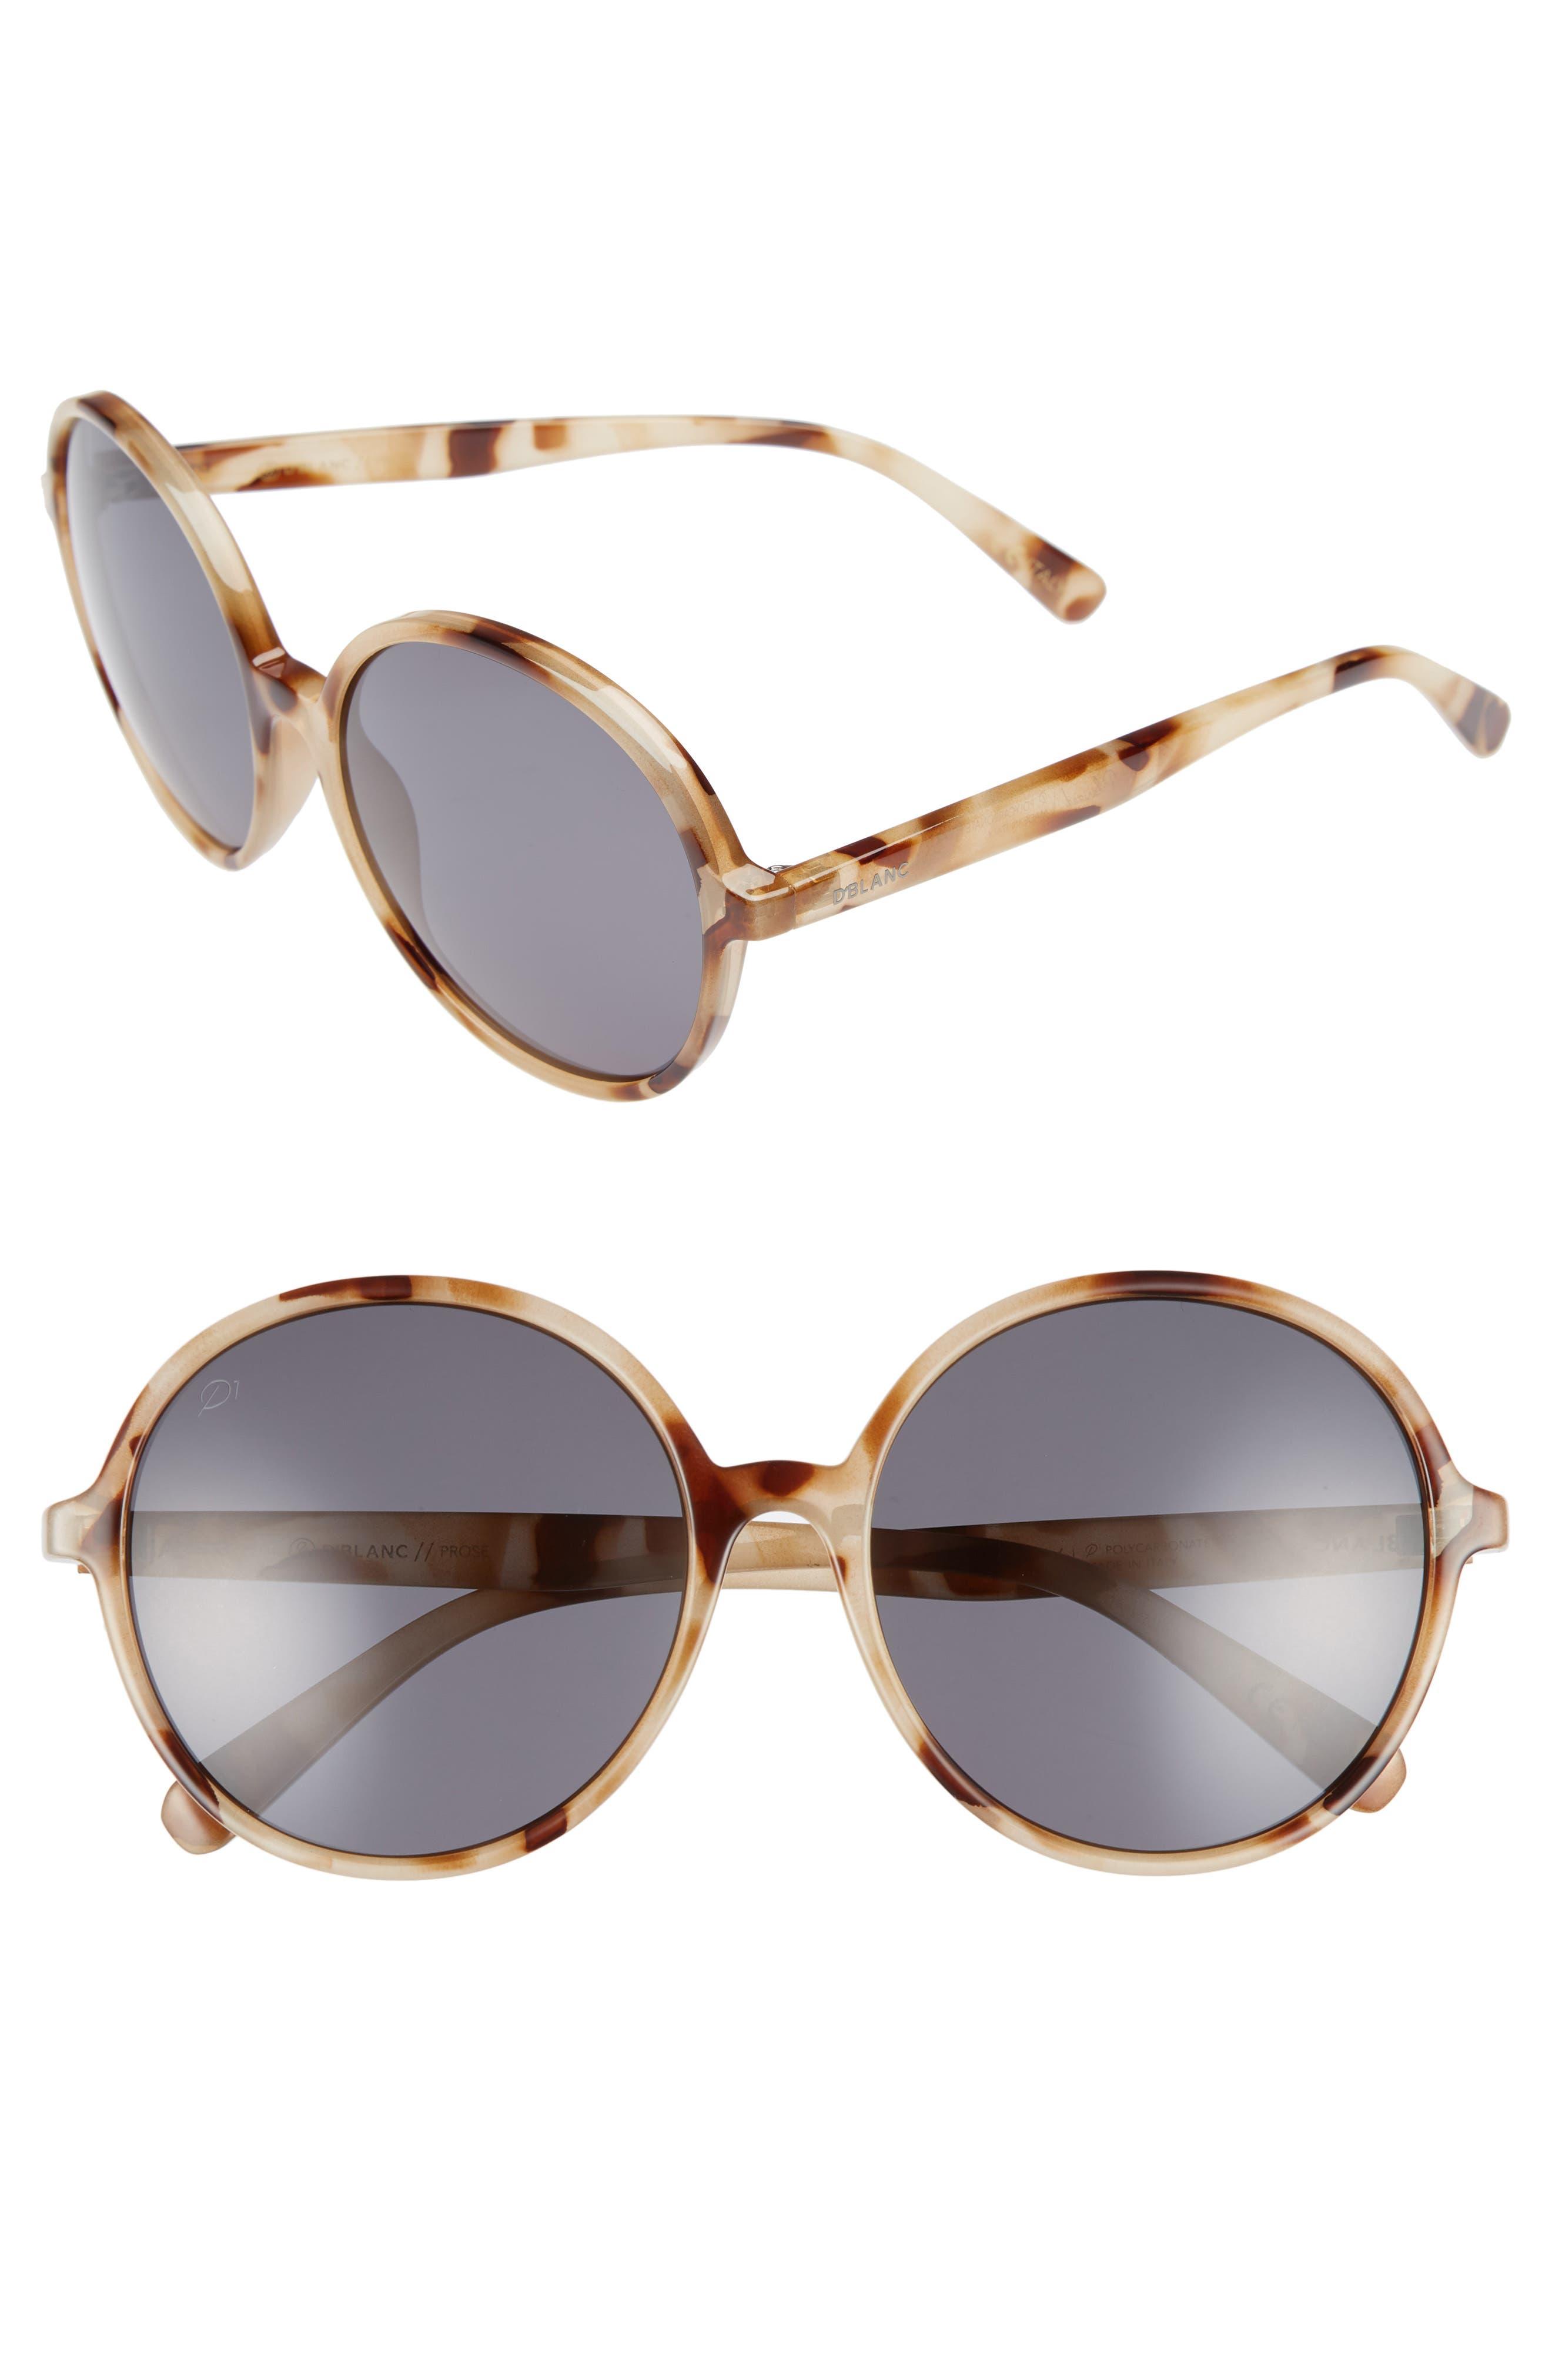 D'BLANC Prose 59mm Round Sunglasses,                             Main thumbnail 1, color,                             SNOW LEOPARD/ GREY POLAR